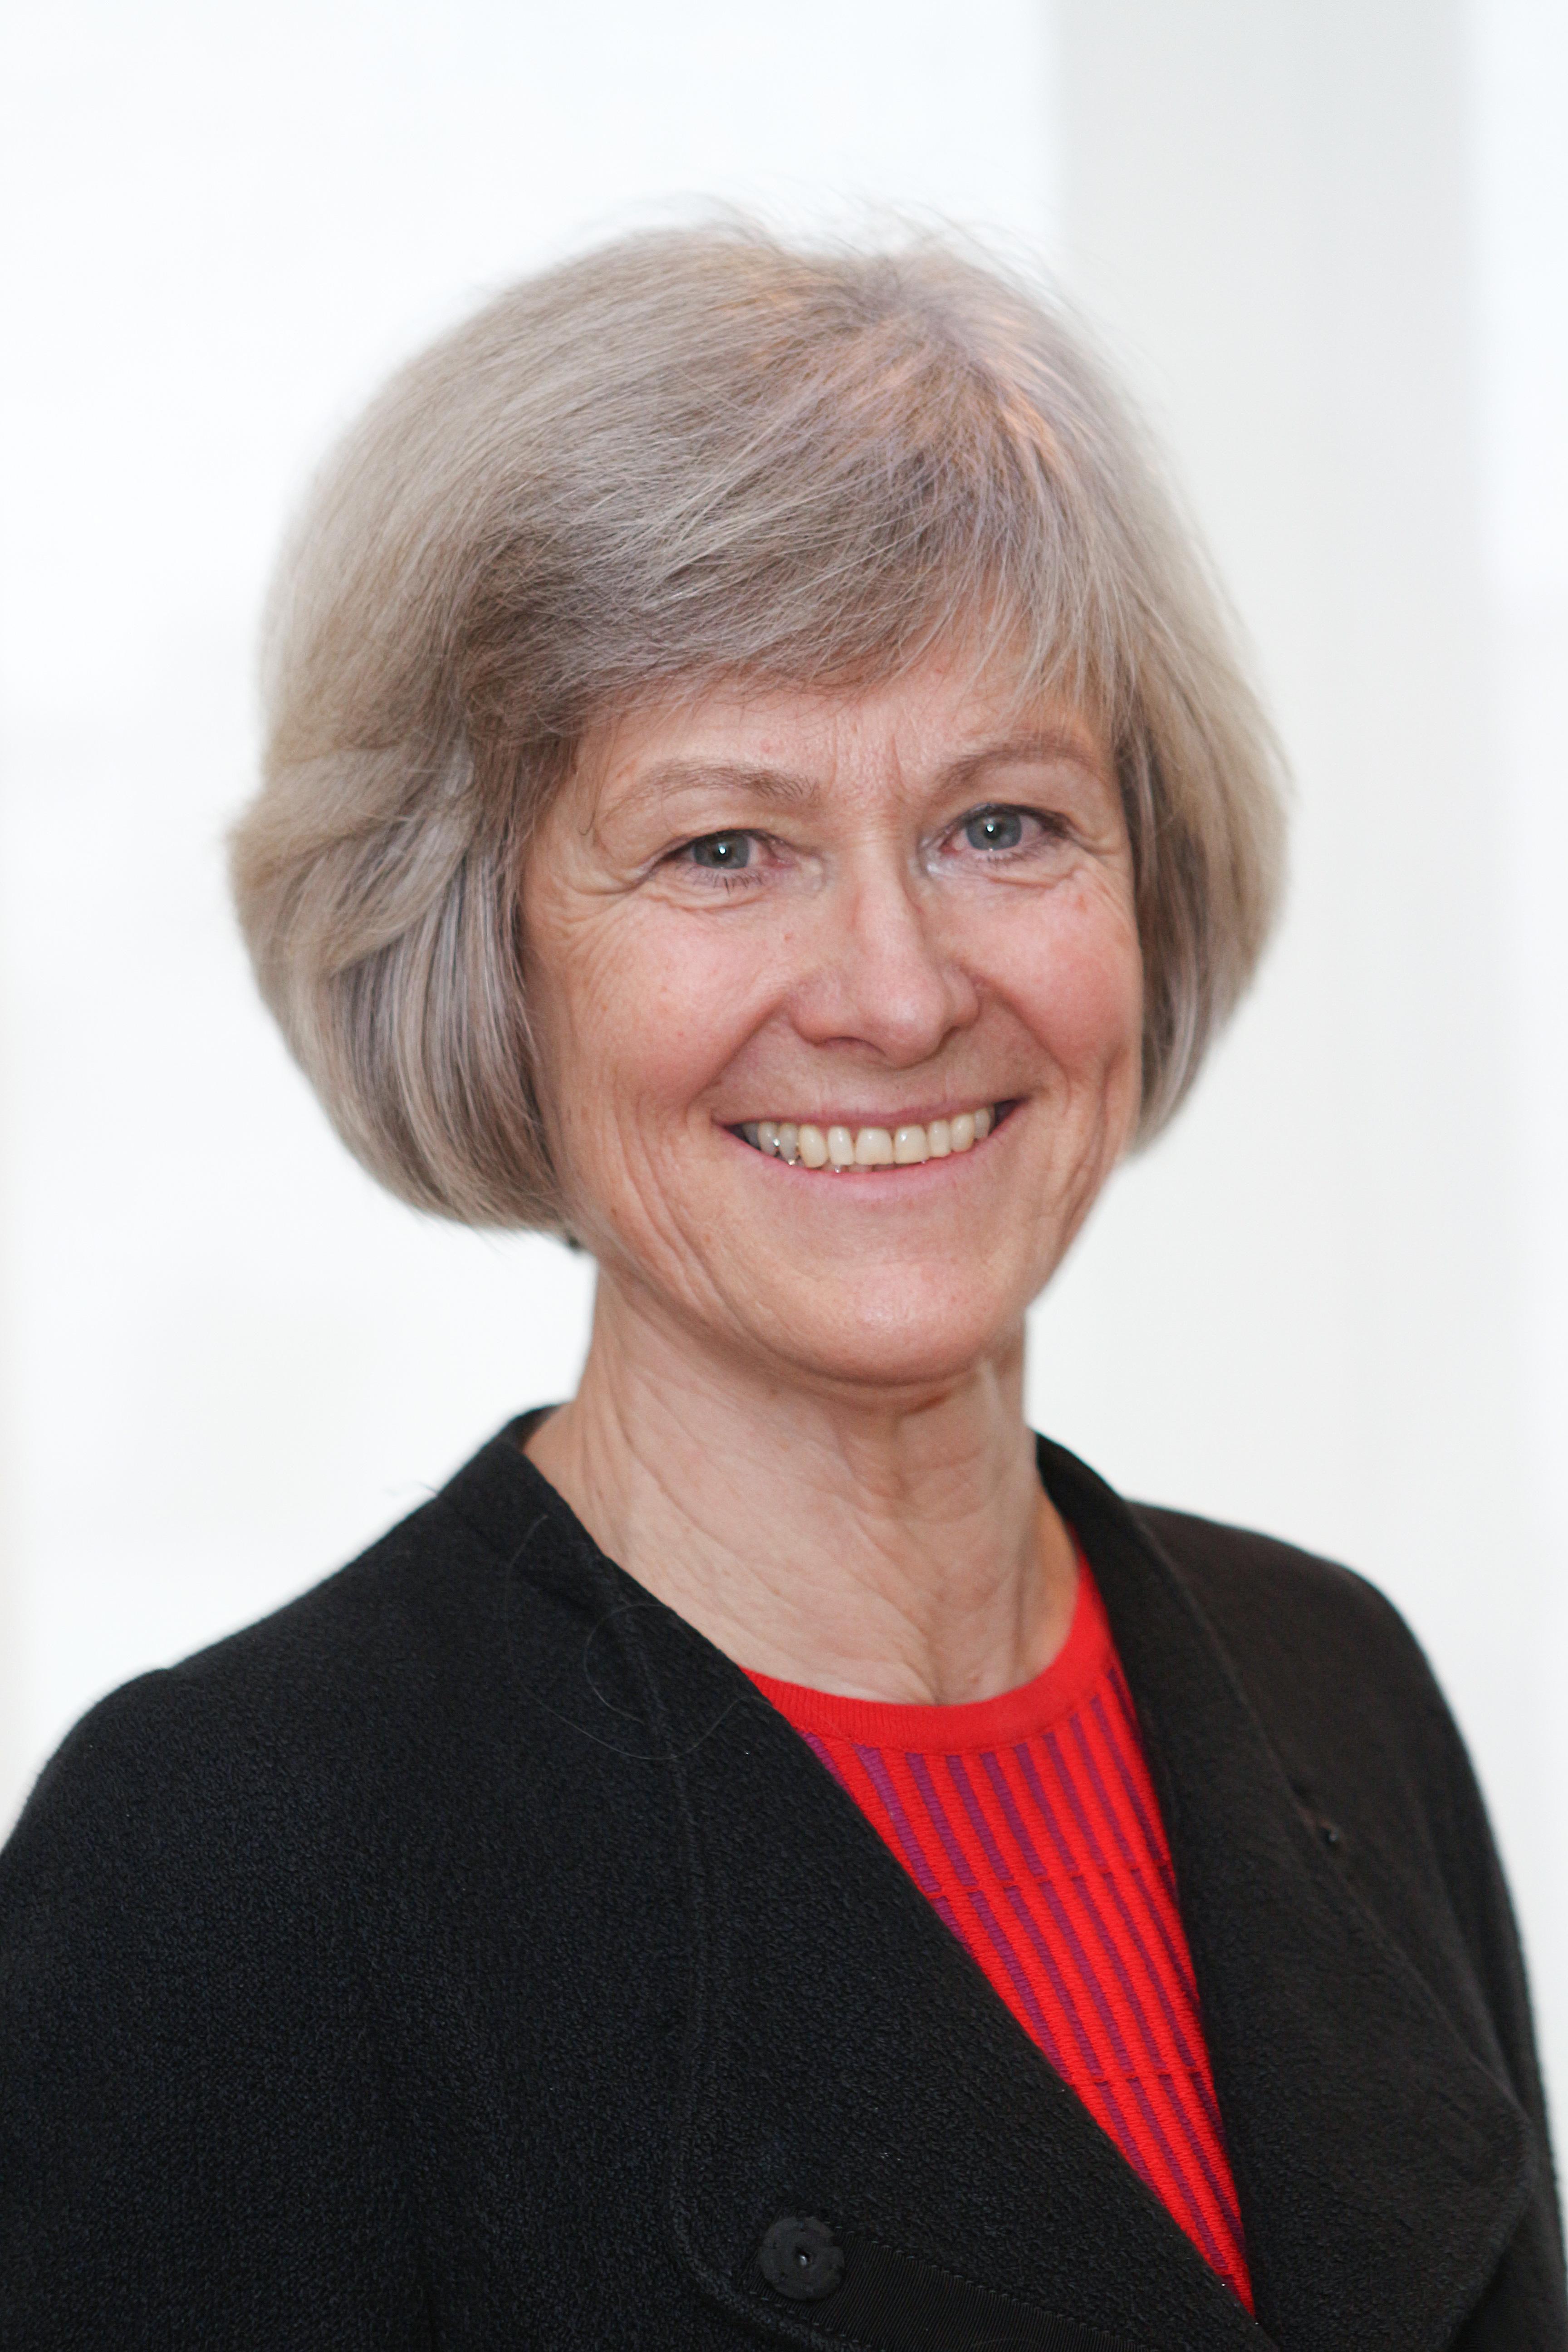 Dr. Daniela Heisel